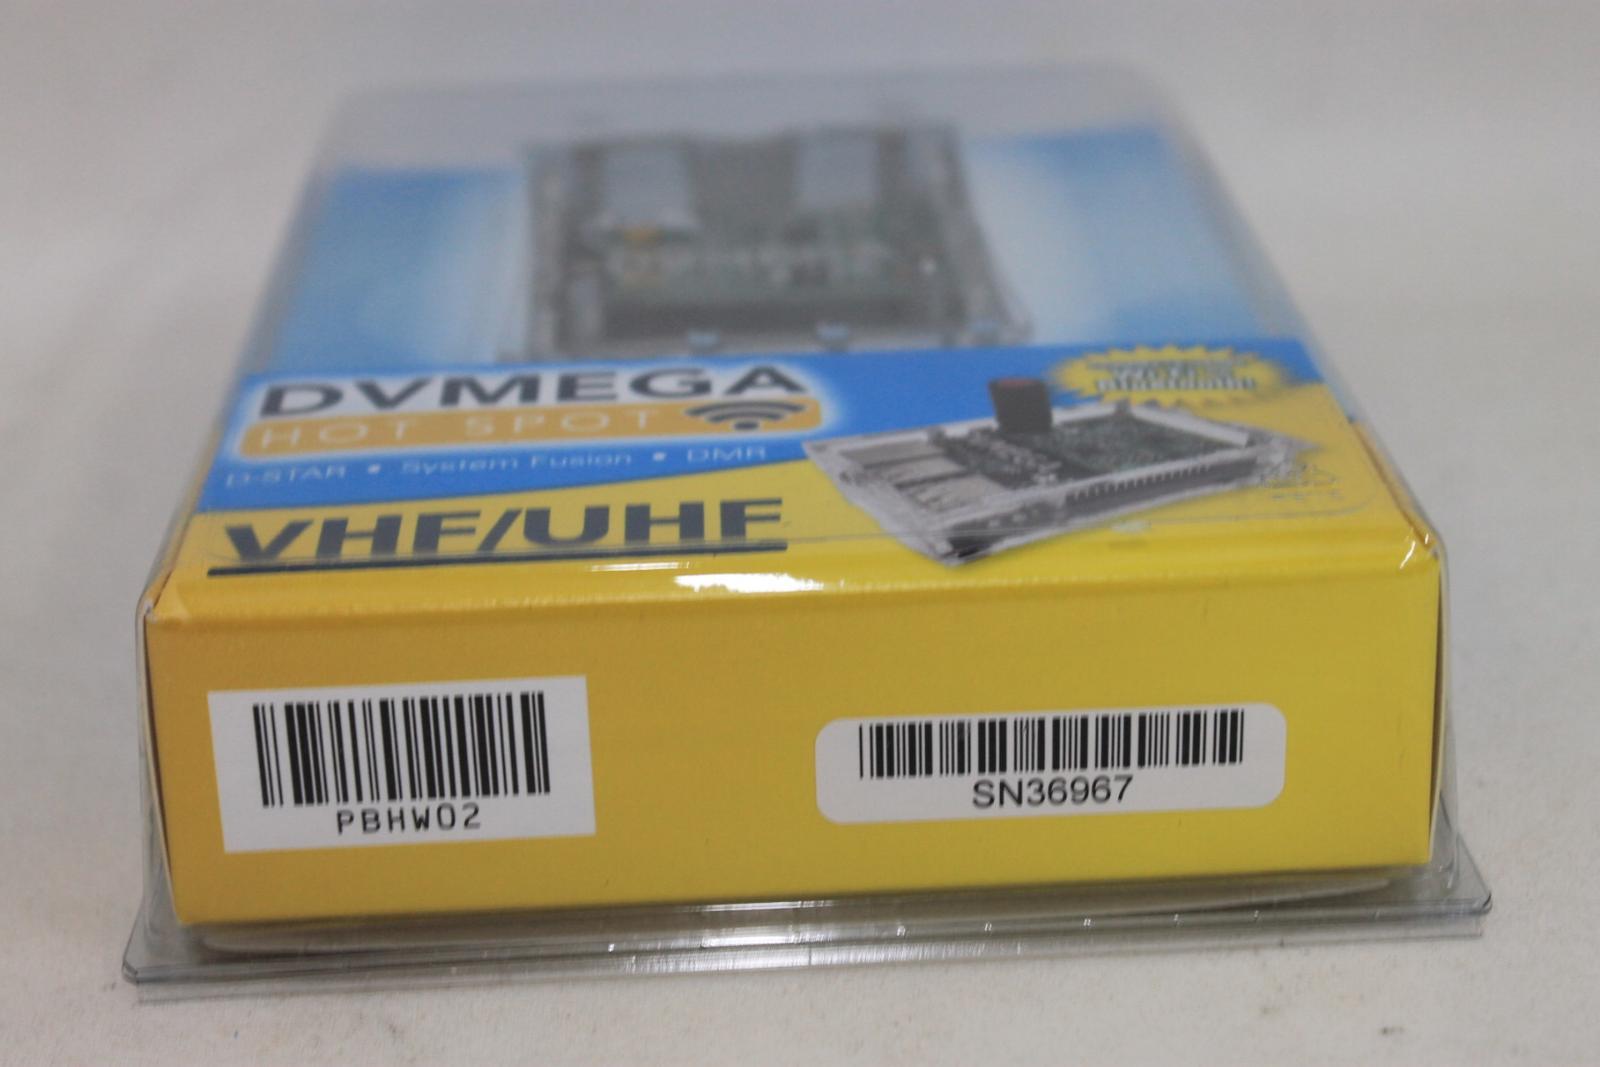 NEW DVMEGA HOT SPOT Dual band VHF/UHF Prebuilt Hotspot Kit For Digital Radios - 7